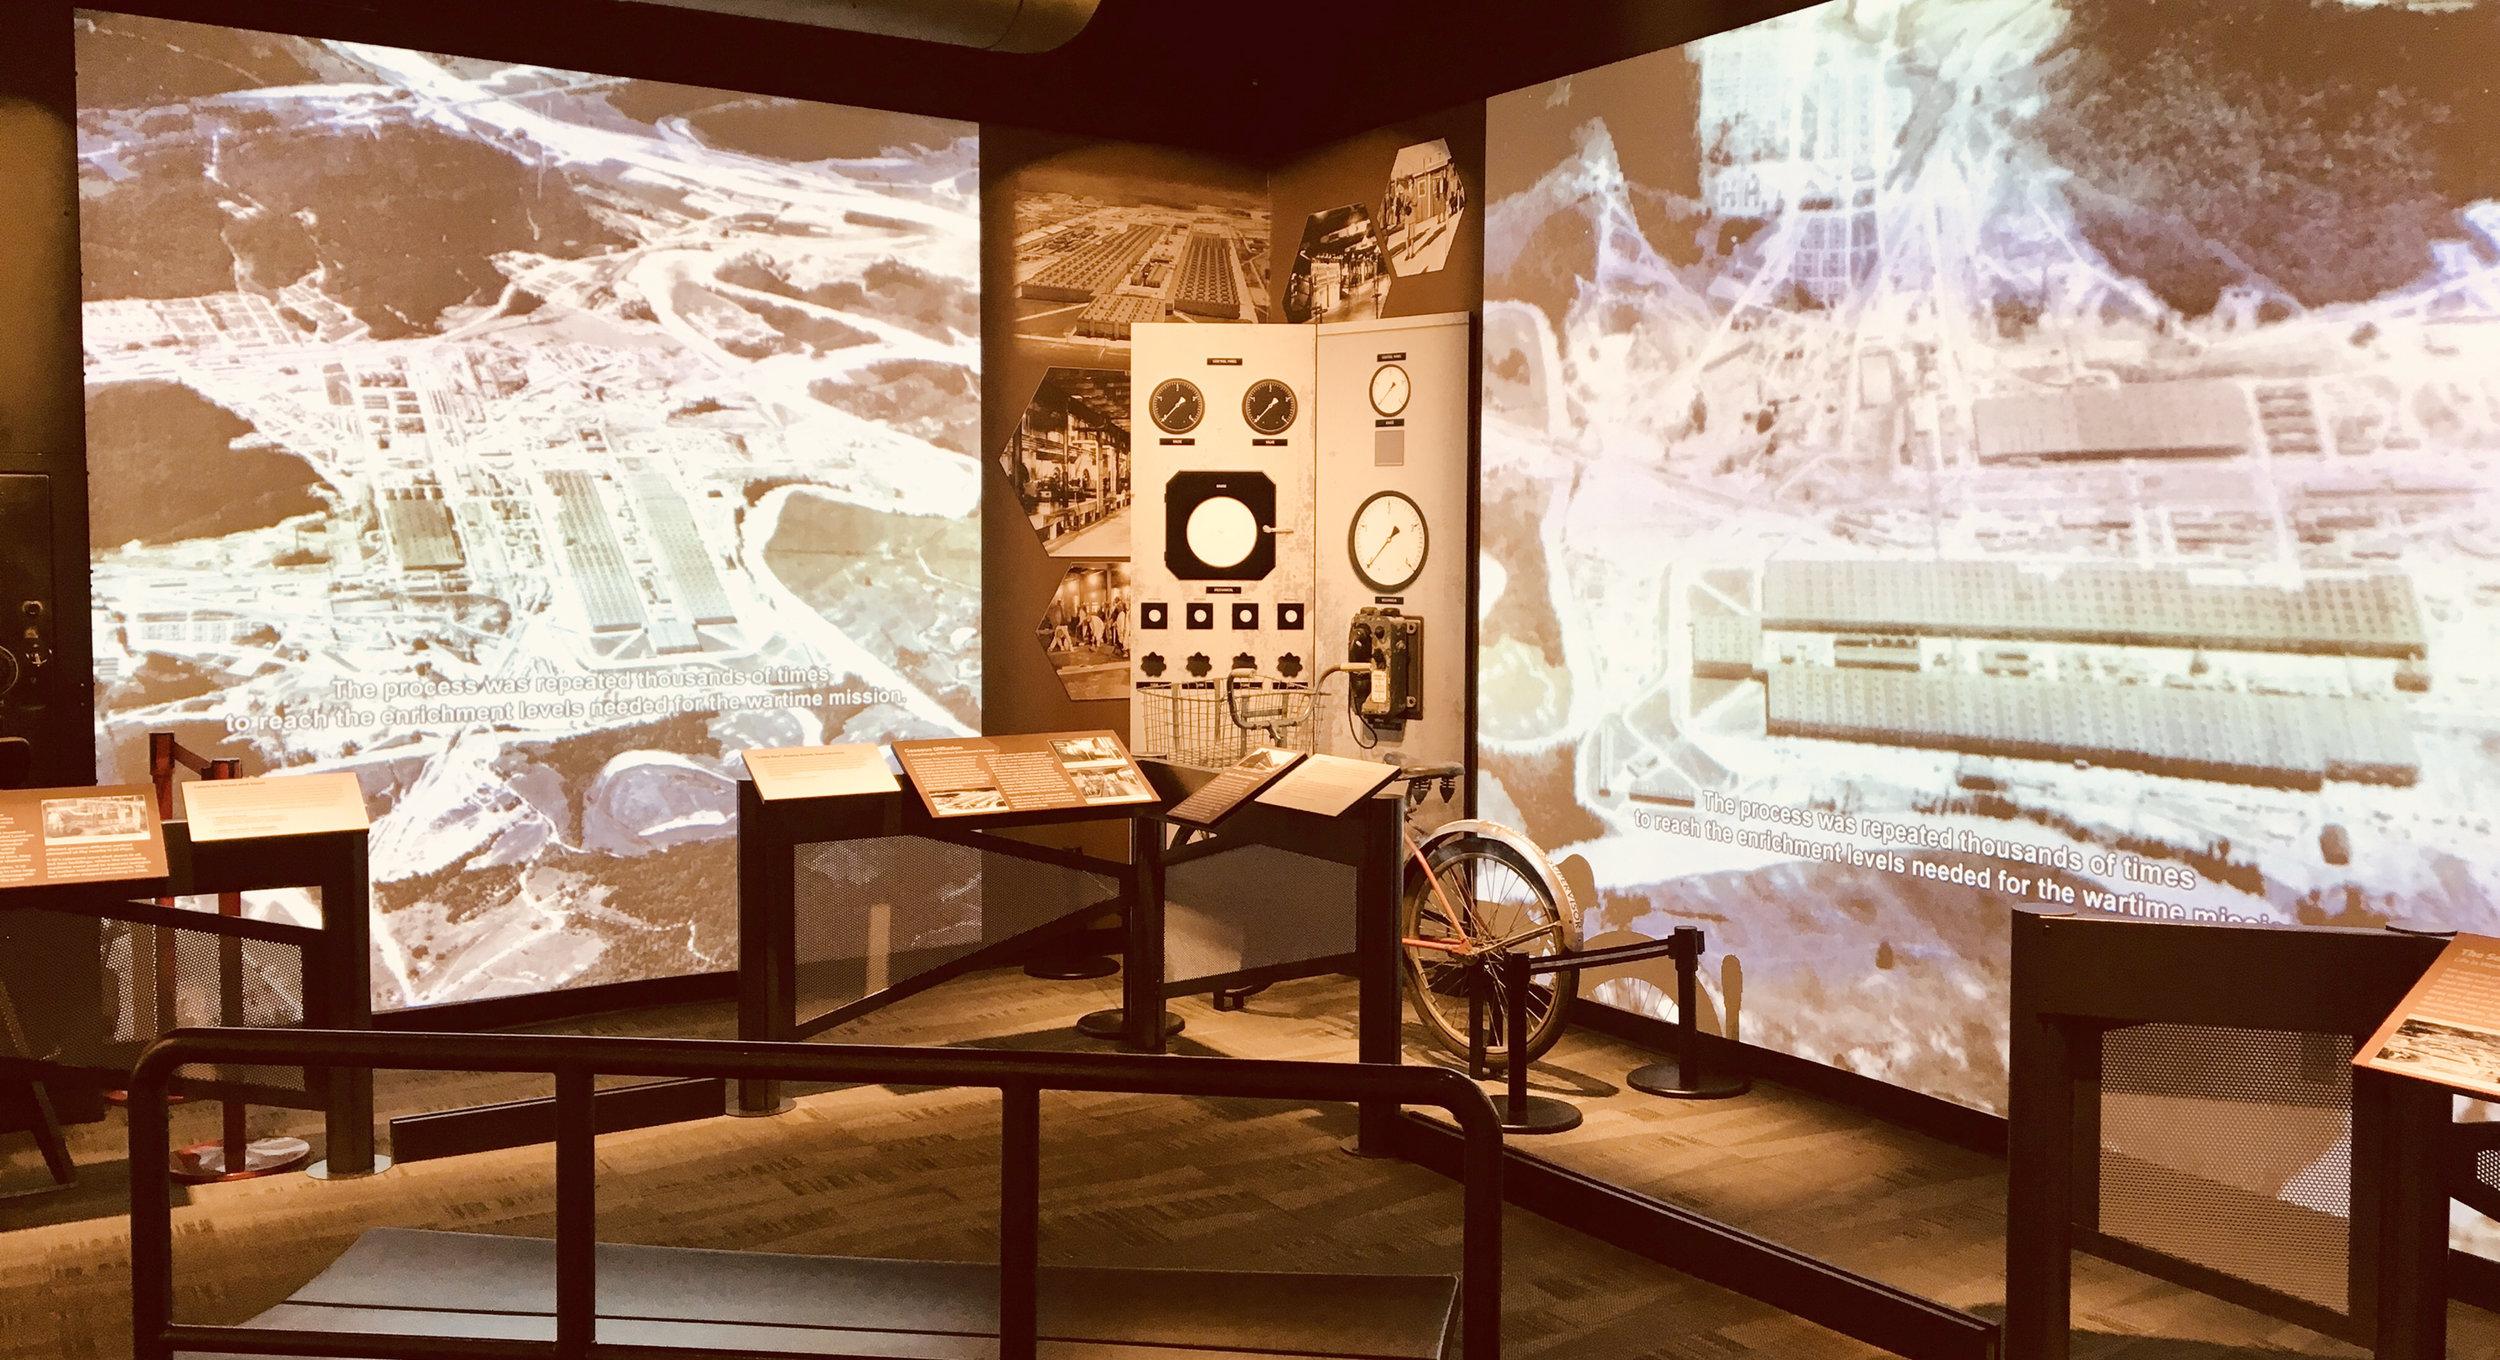 american museum of science & energy